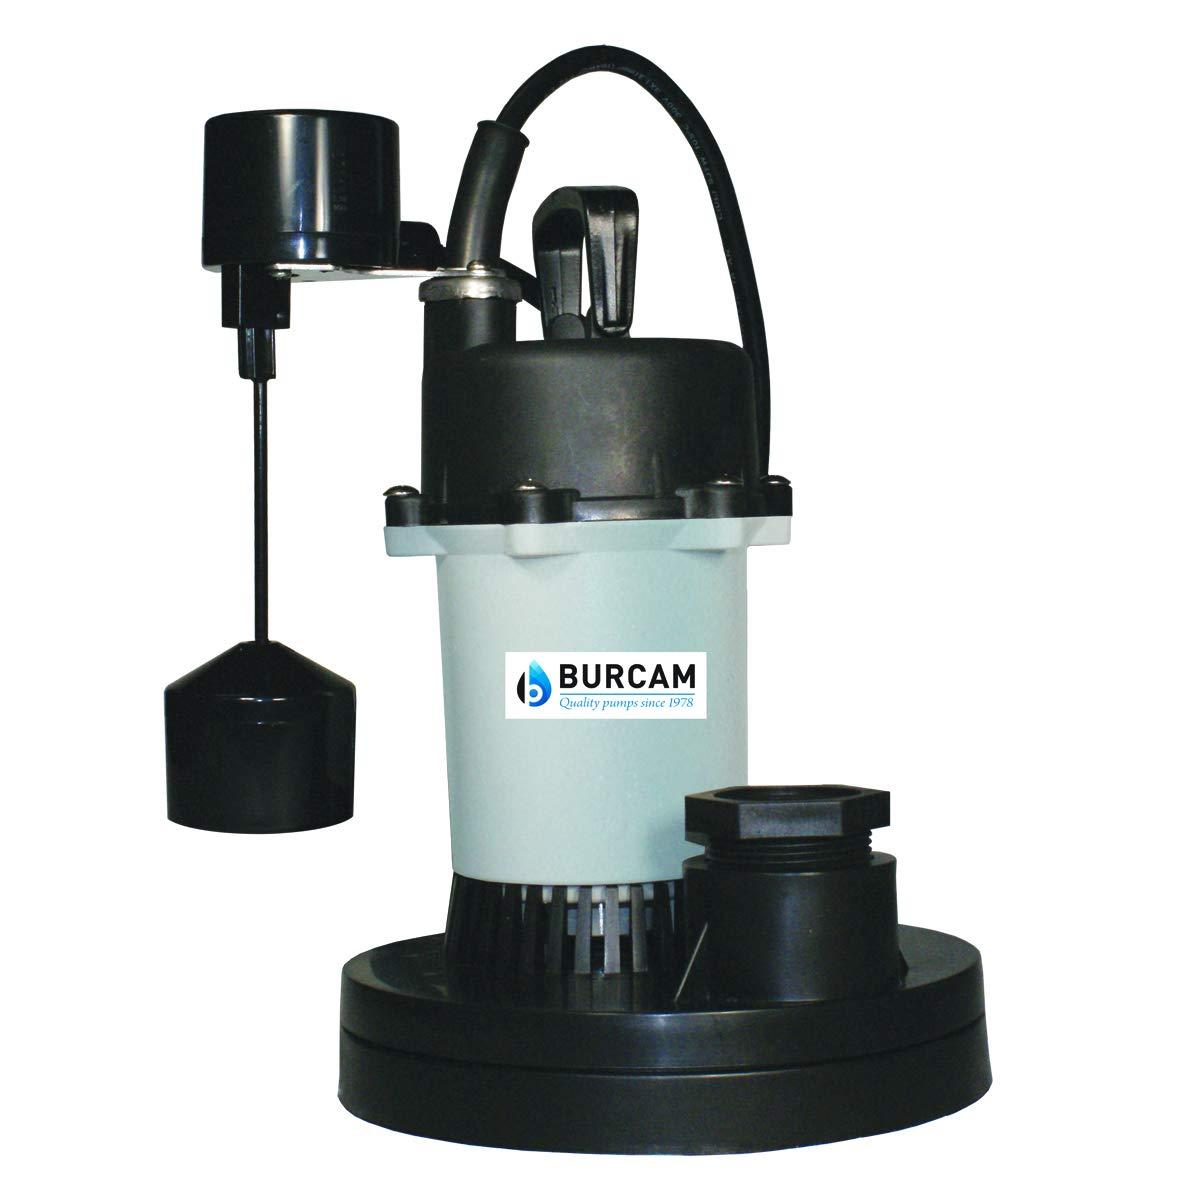 BURCAM 300610Z 1/3 HP Zinc Submersible Sump Pump With Vertical Float Switch